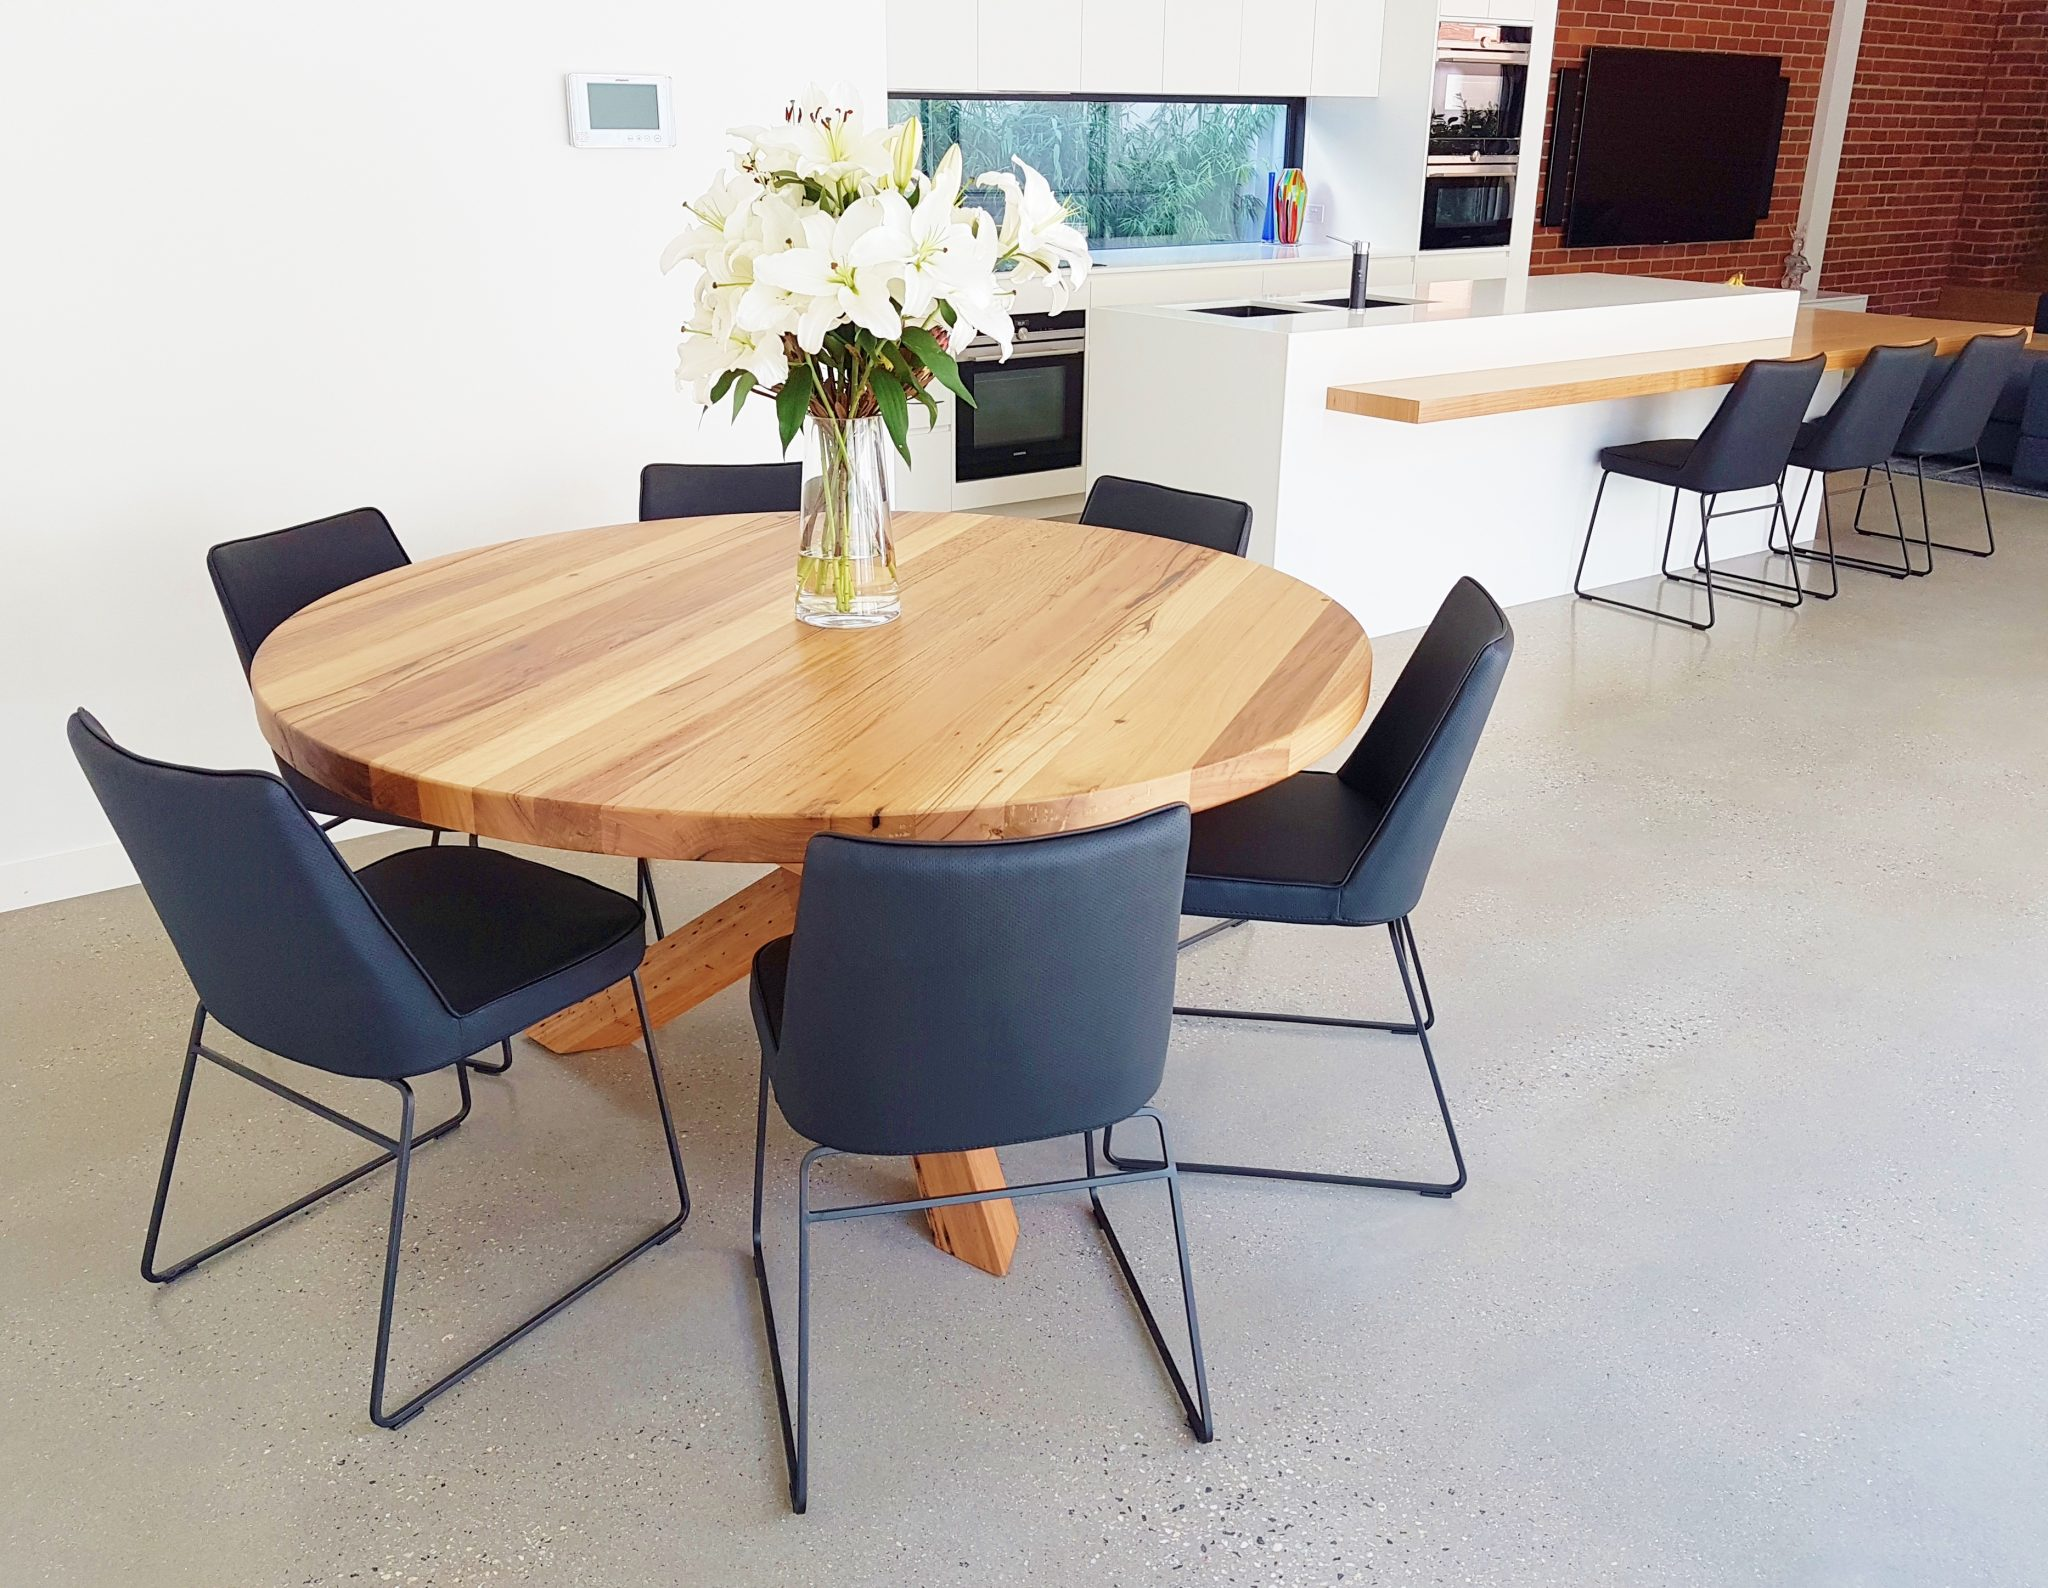 dining tables australia photo - 5